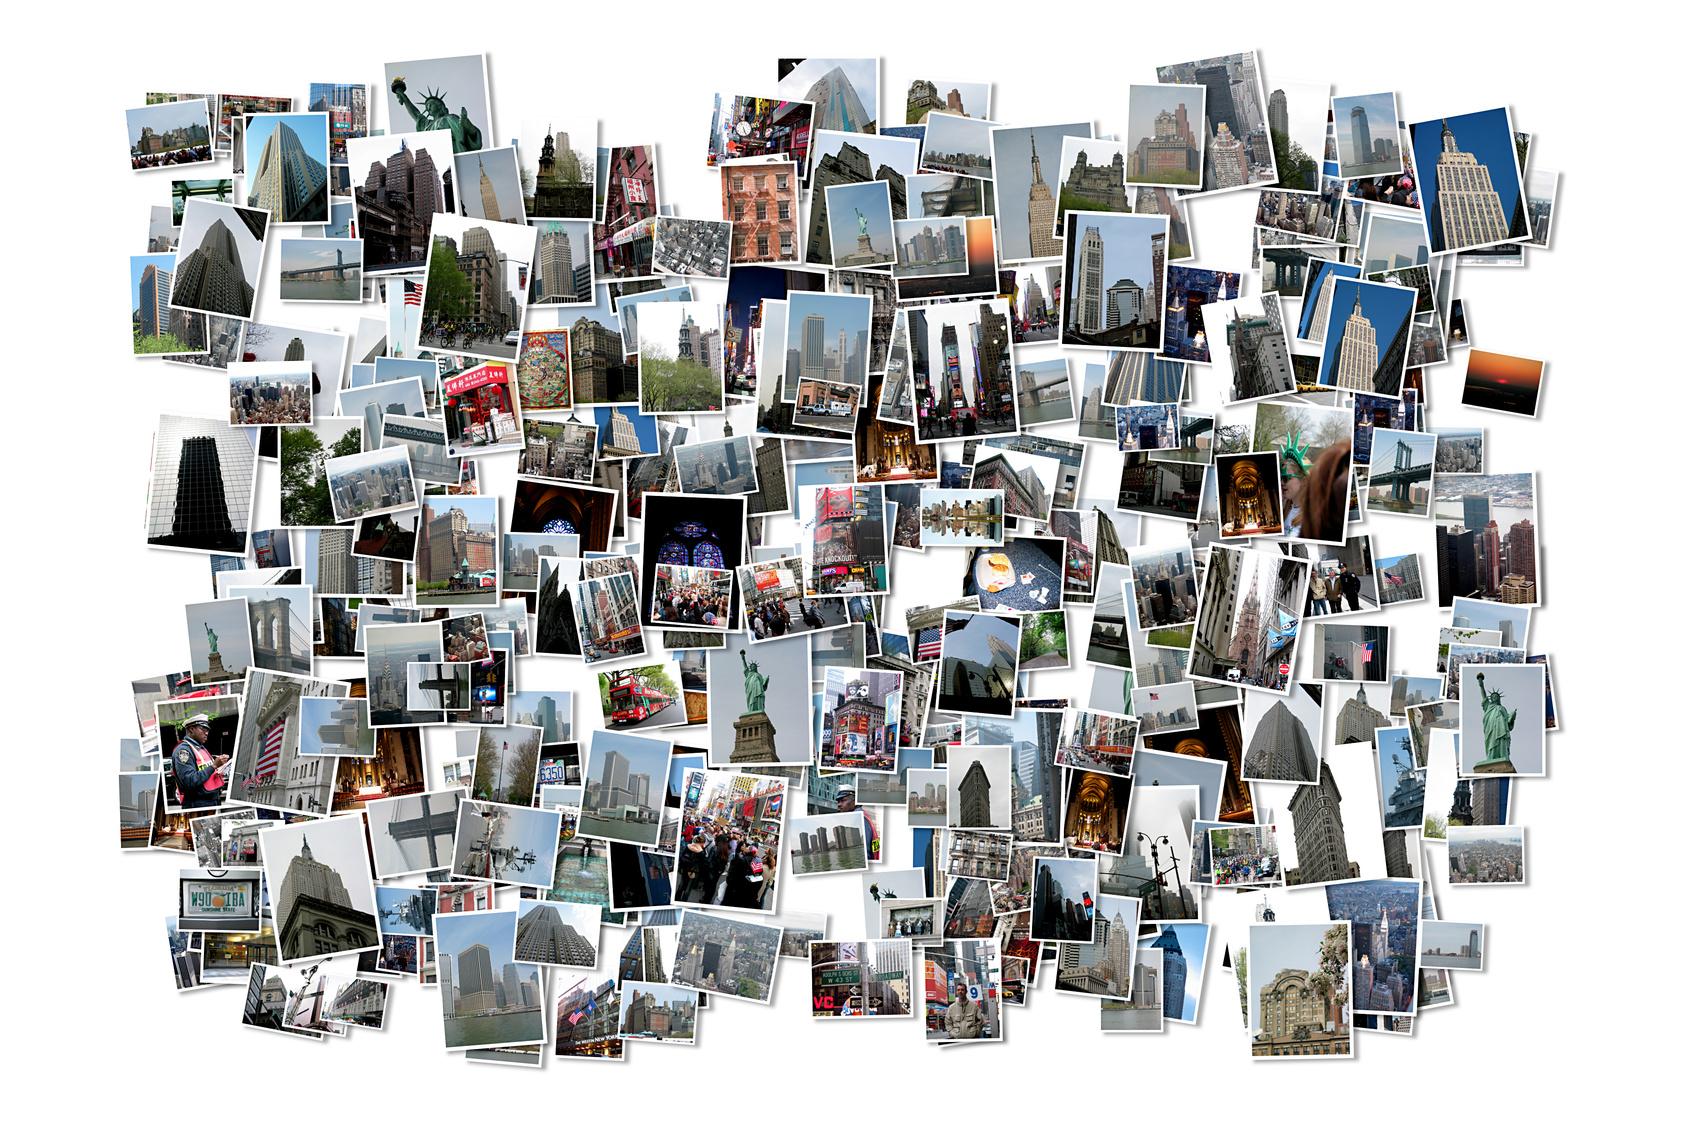 Wiso selbst Fotos drucken?